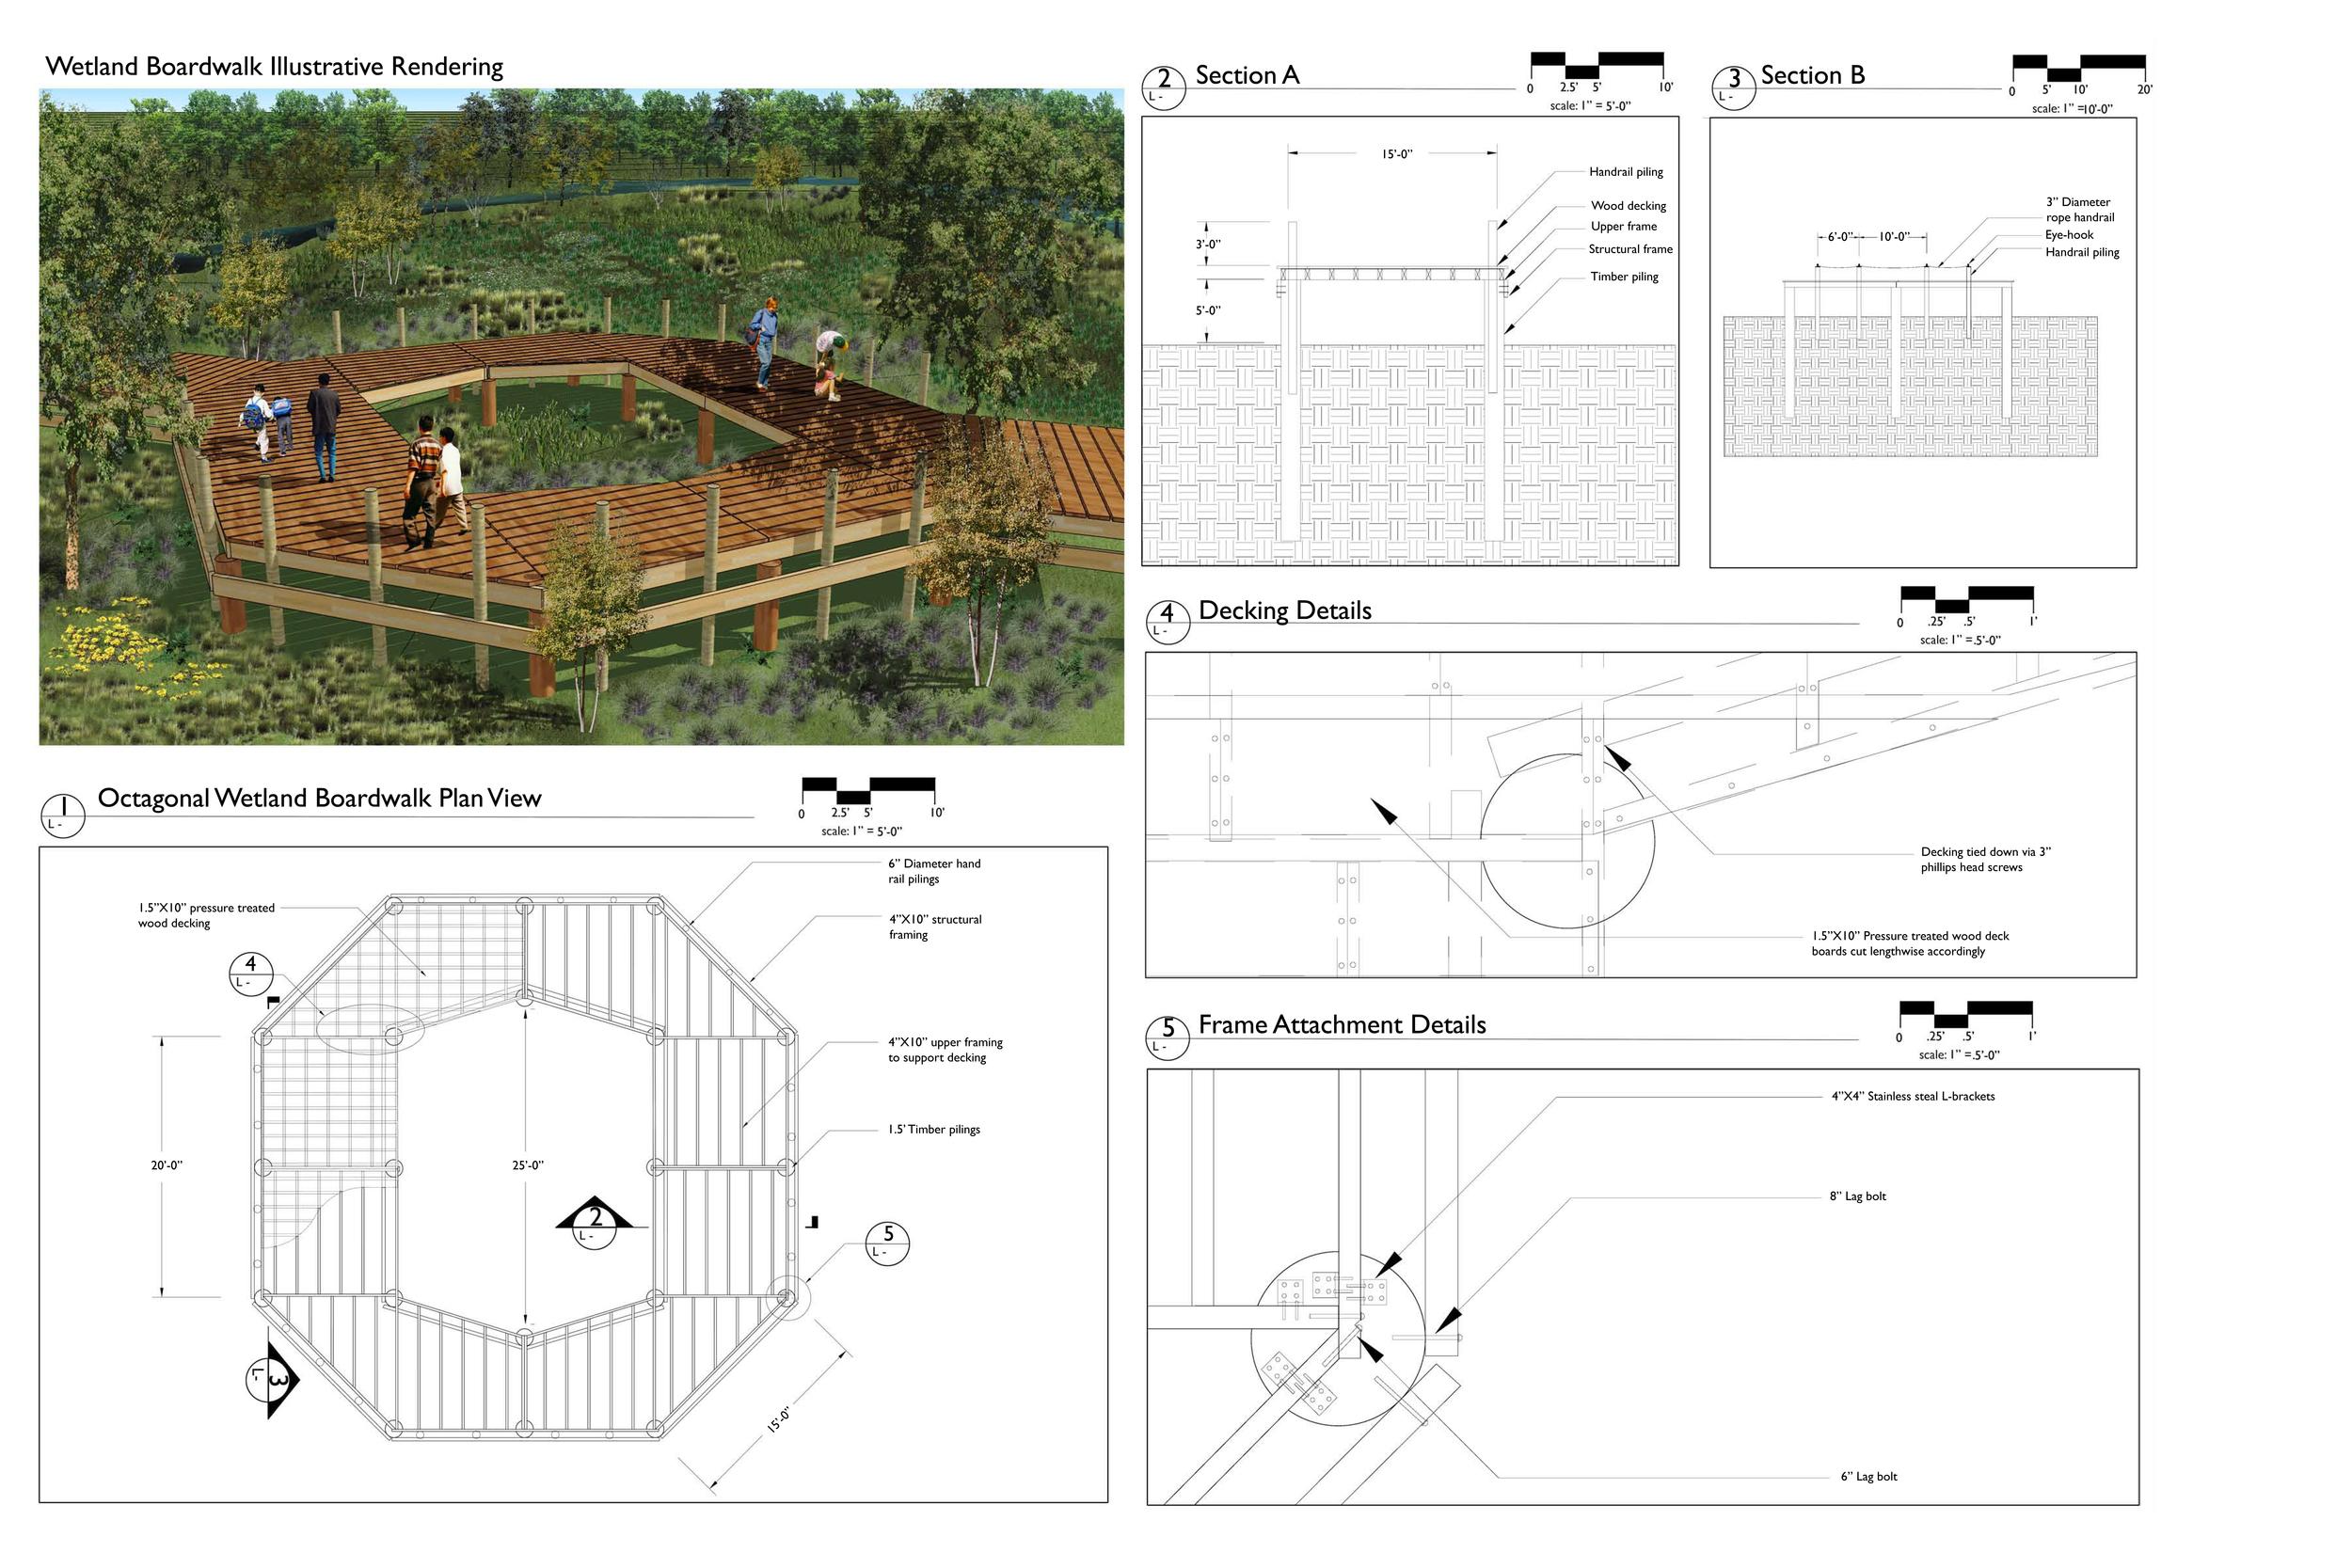 Wetland Boardwalk Design